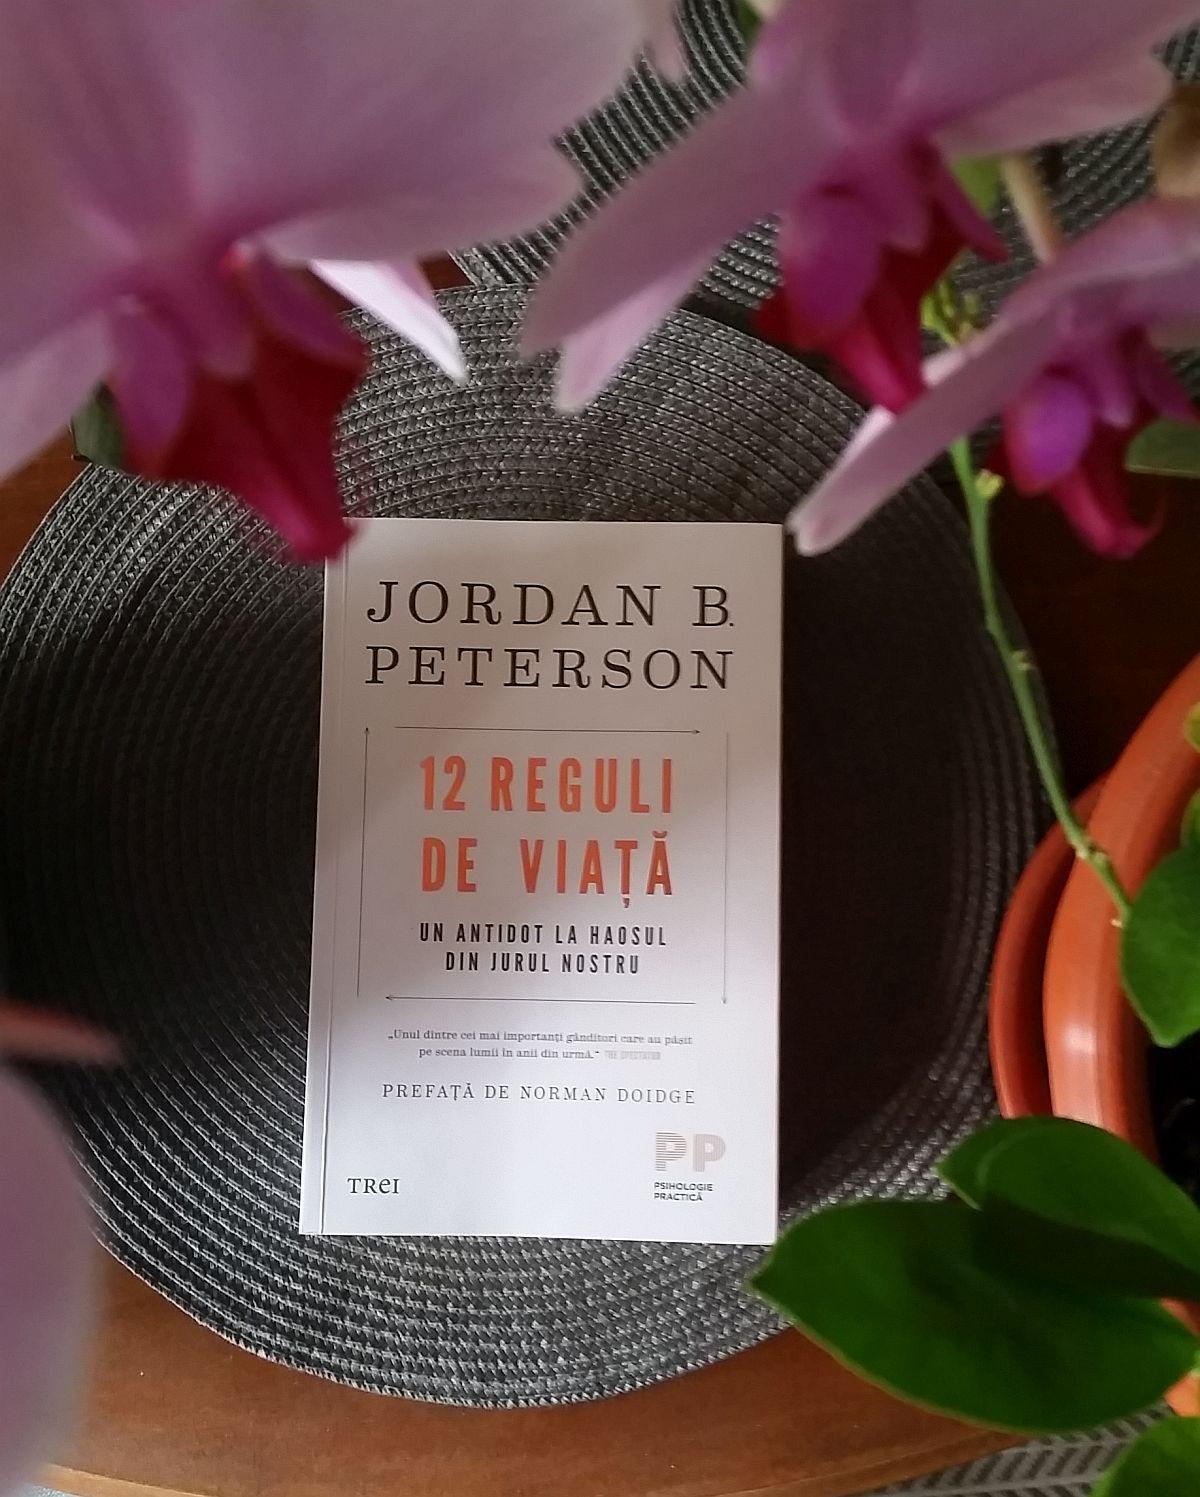 adelaparvu.com despre 12 Reguli de viata, Jordan B Peterson, Editura Trei (3)